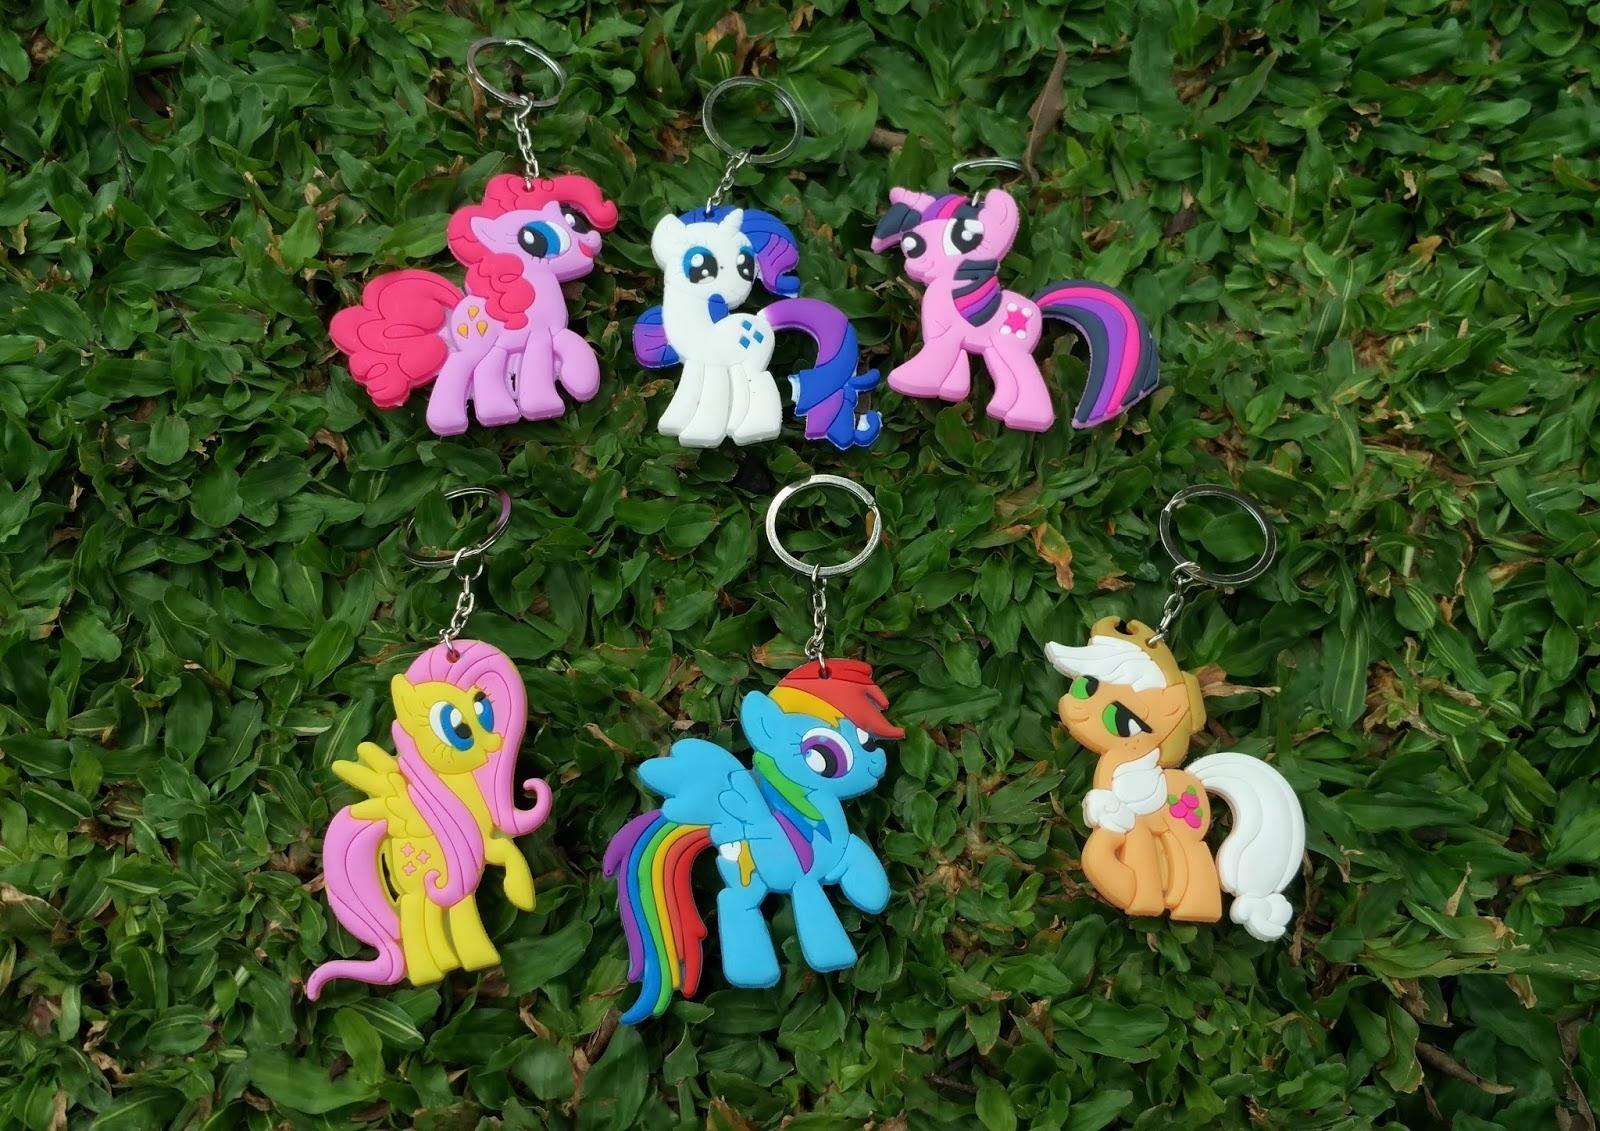 mainan little pony, gantungan kunci little pony, kolesi little pony, karakter little pony, pernak pernik little pony, gantungan kunci, gantungan kunci lucu, souvenir litlle pony